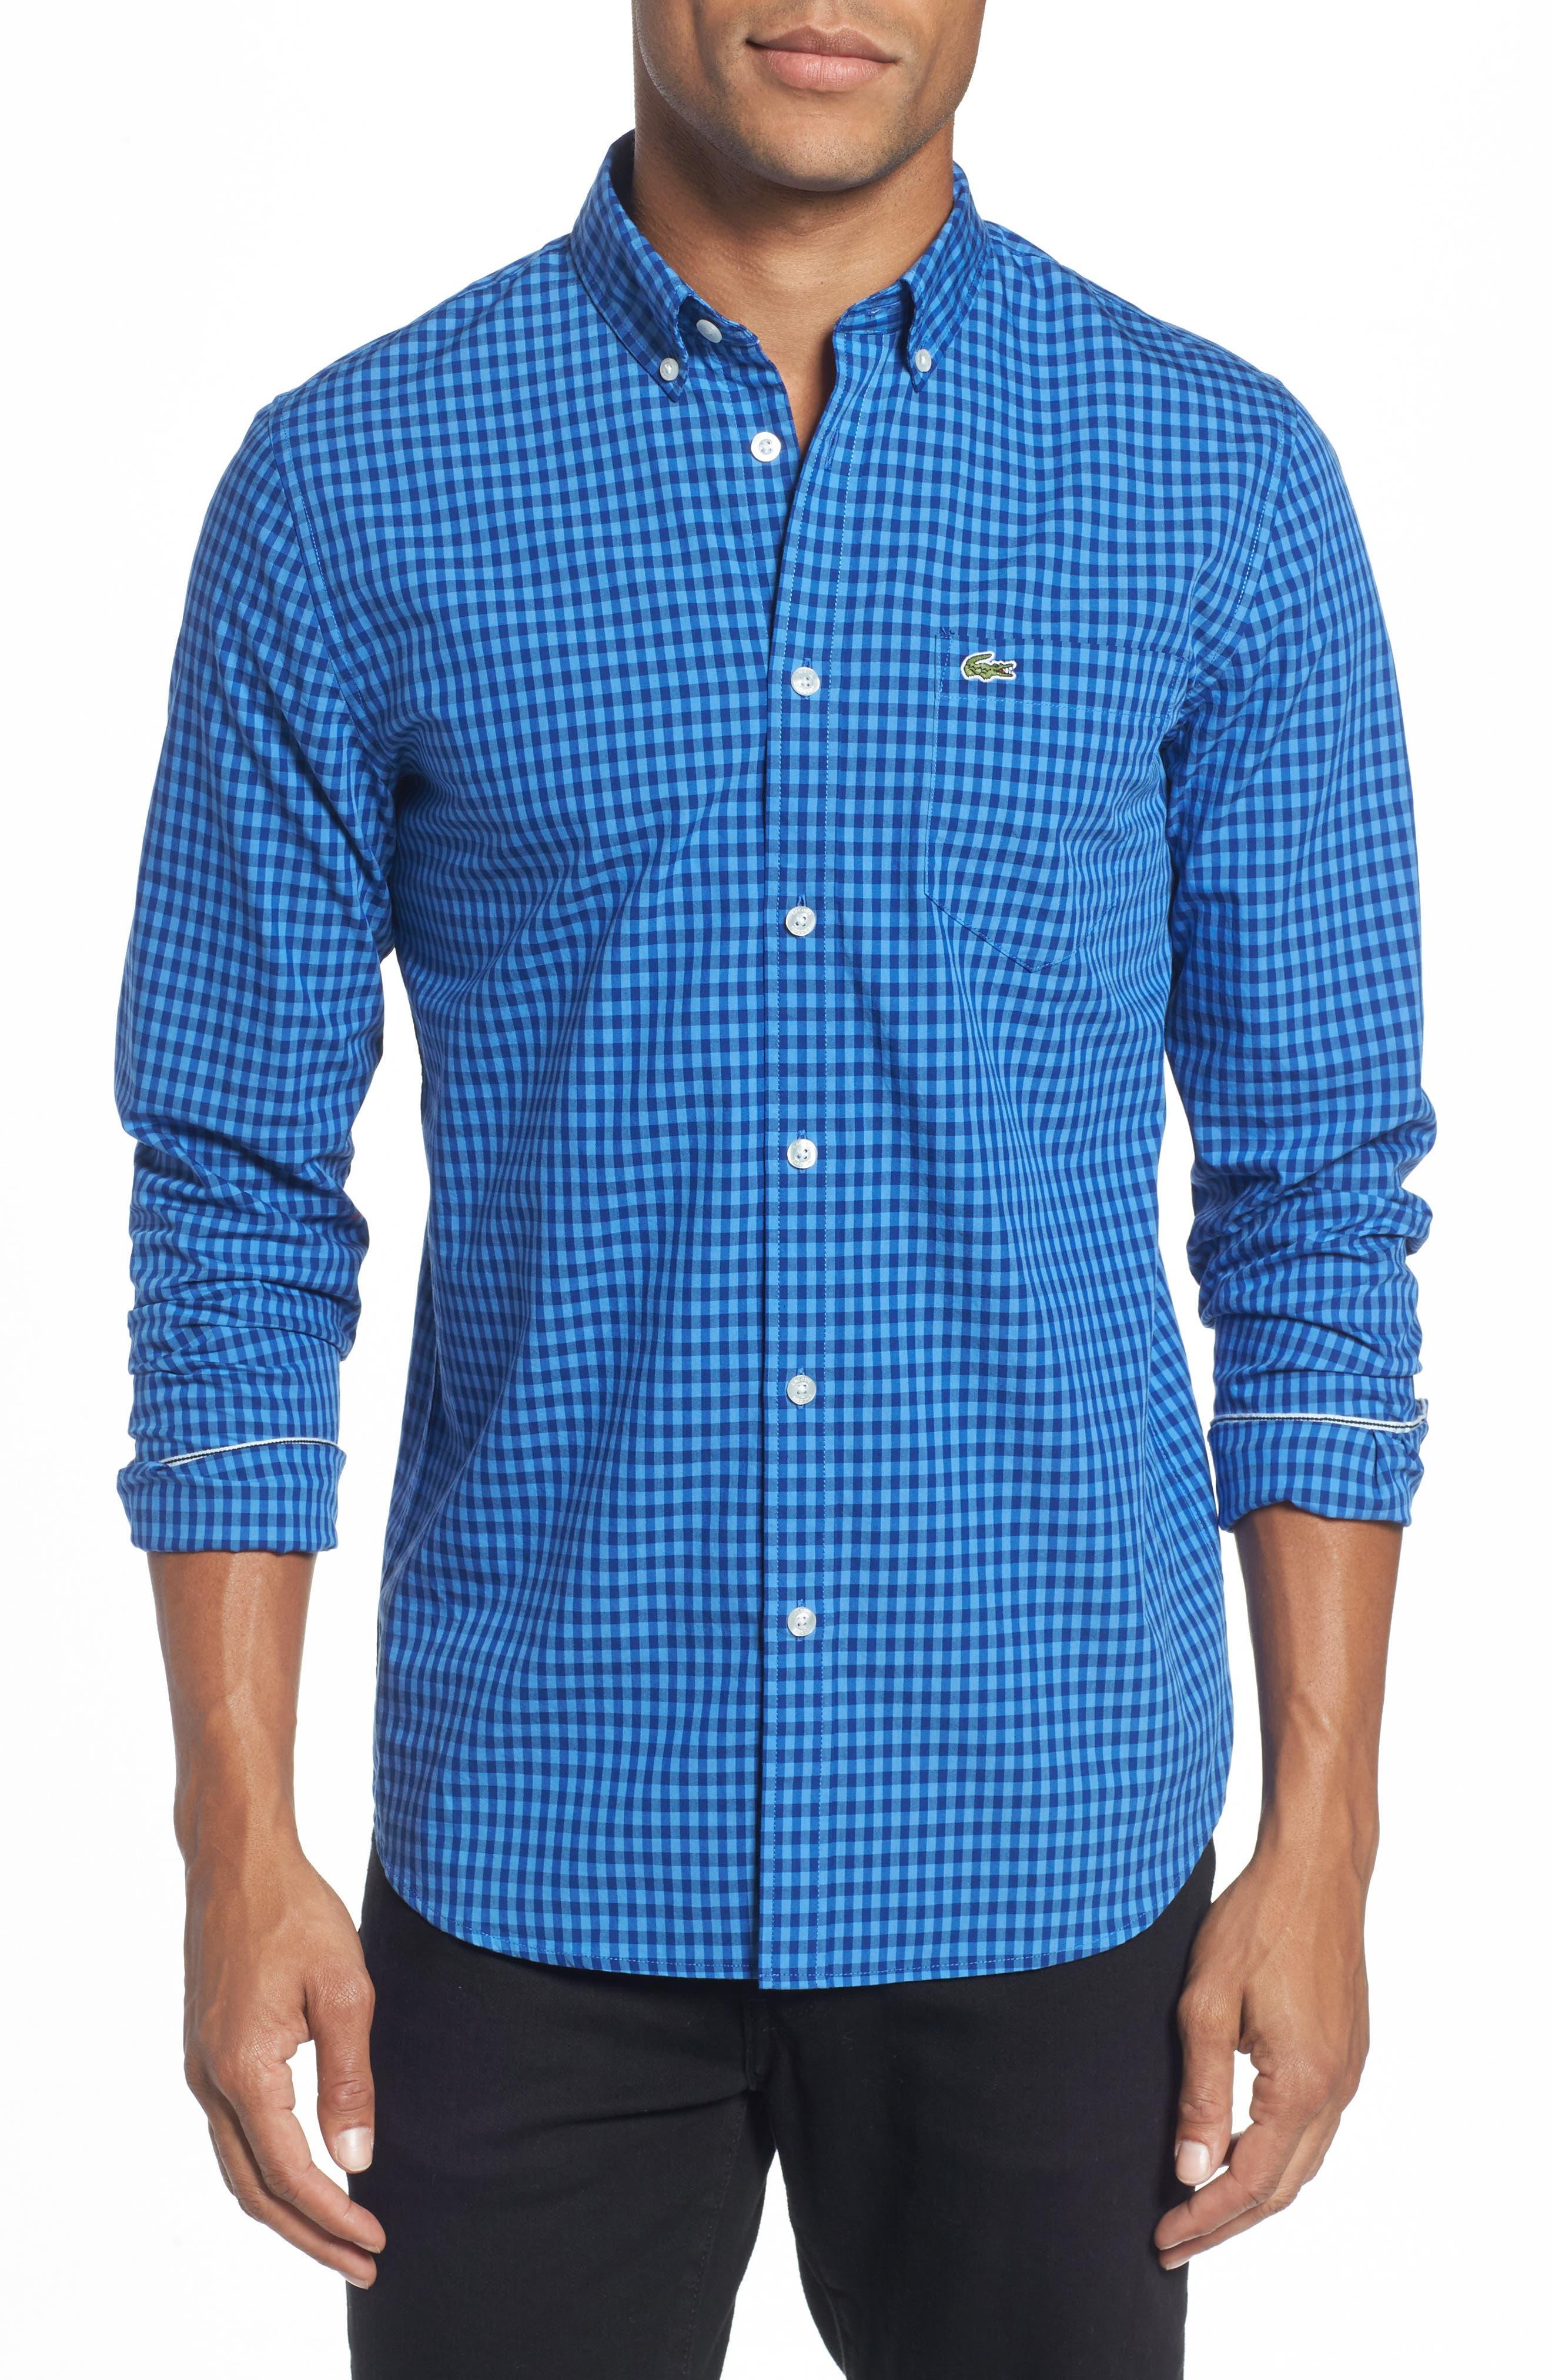 Gingham Check Poplin Shirt,                             Main thumbnail 1, color,                             493